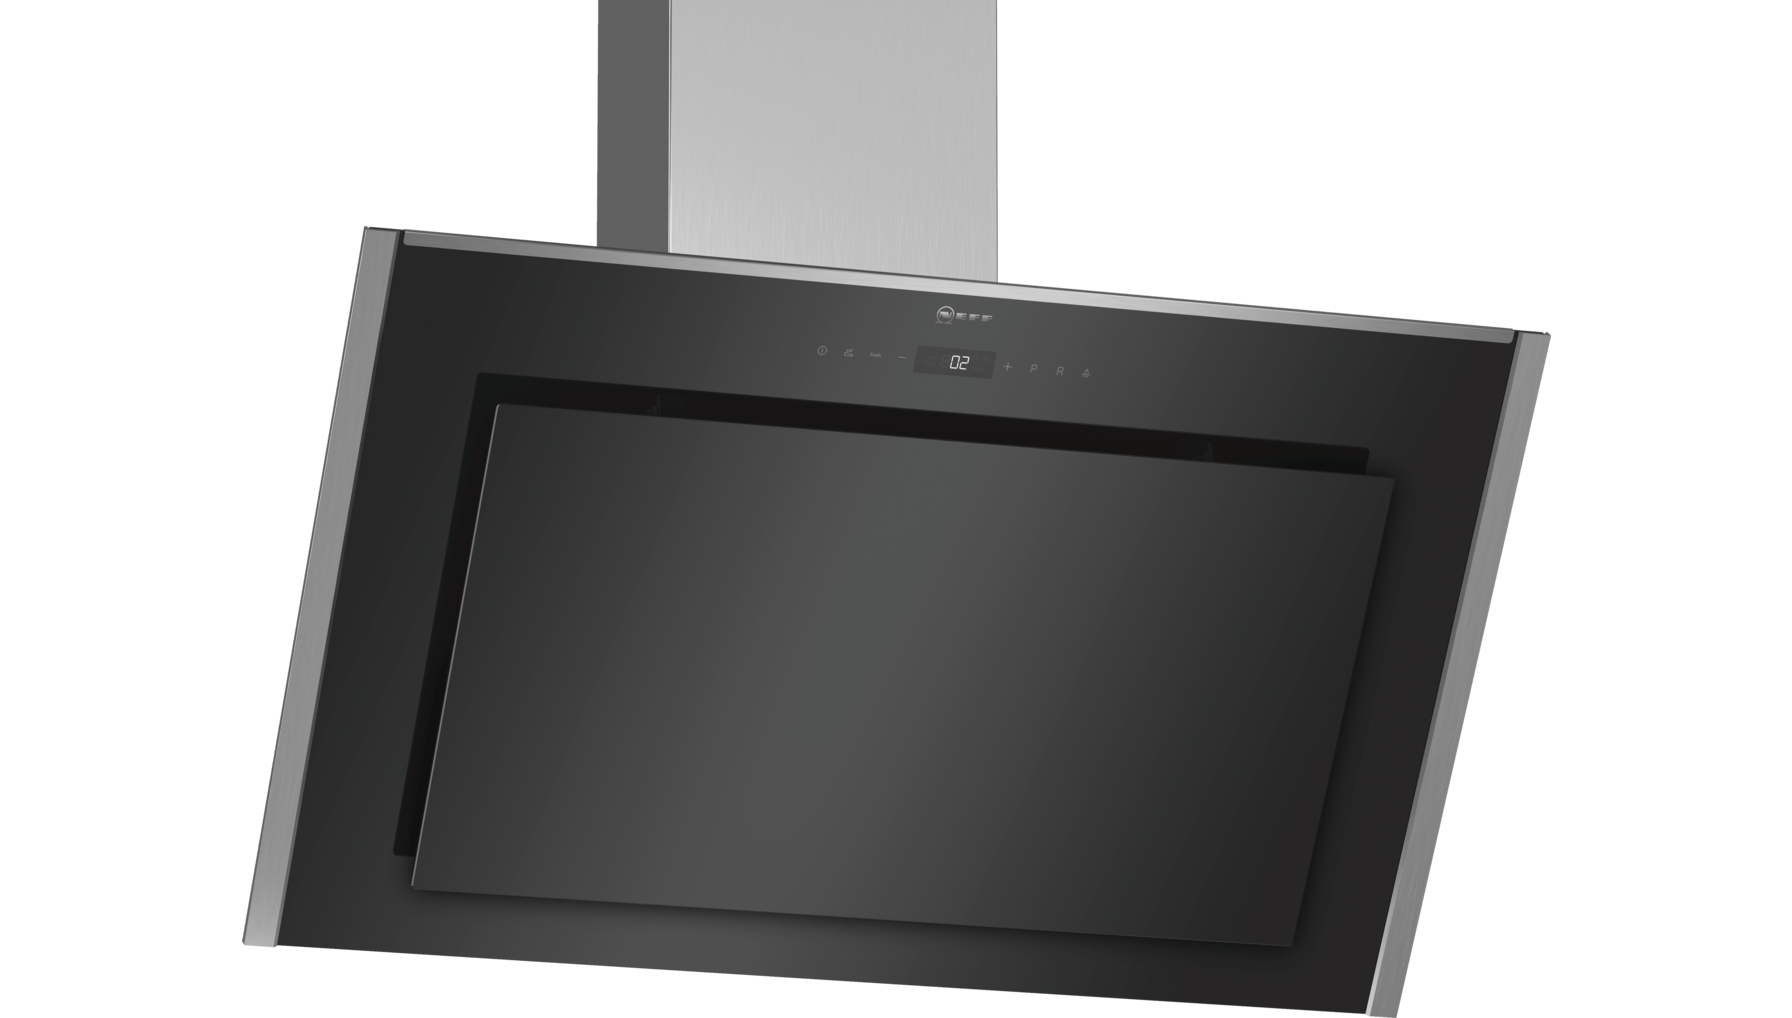 neff produkte dunstabzugshauben wandessen d96imv1n0. Black Bedroom Furniture Sets. Home Design Ideas